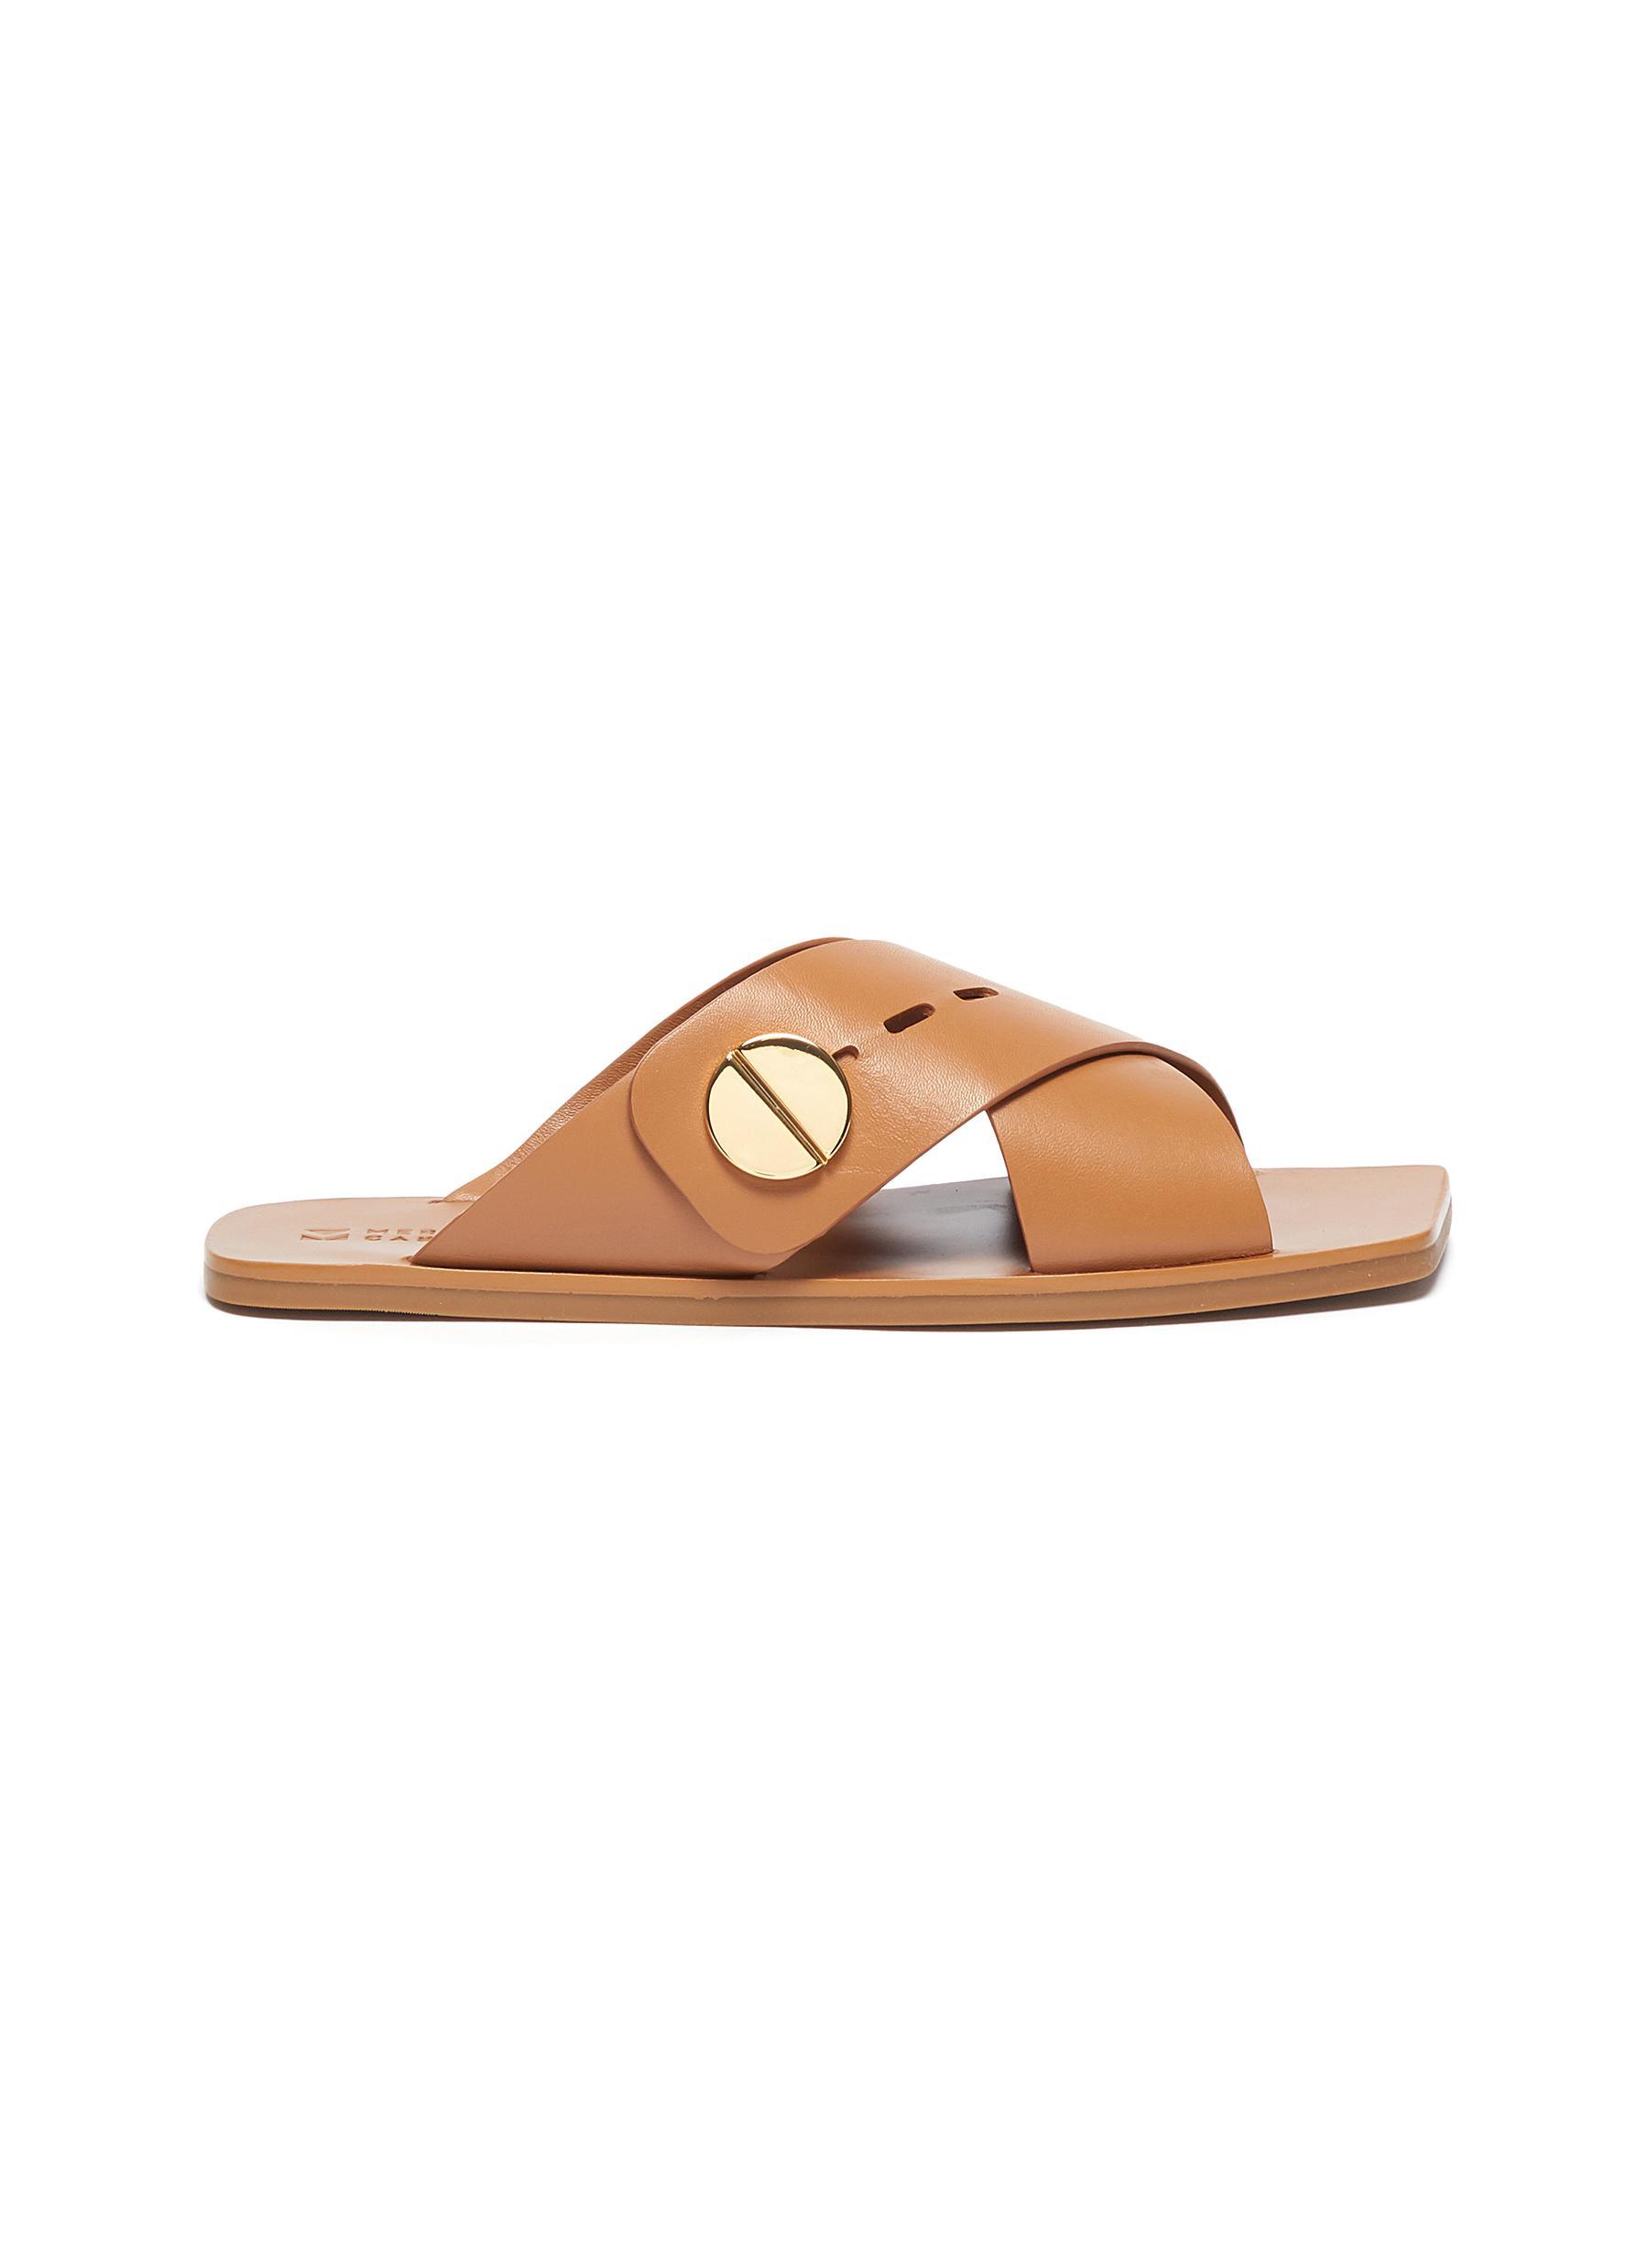 Agatha' Crisscross Band Flat Leather Sandals